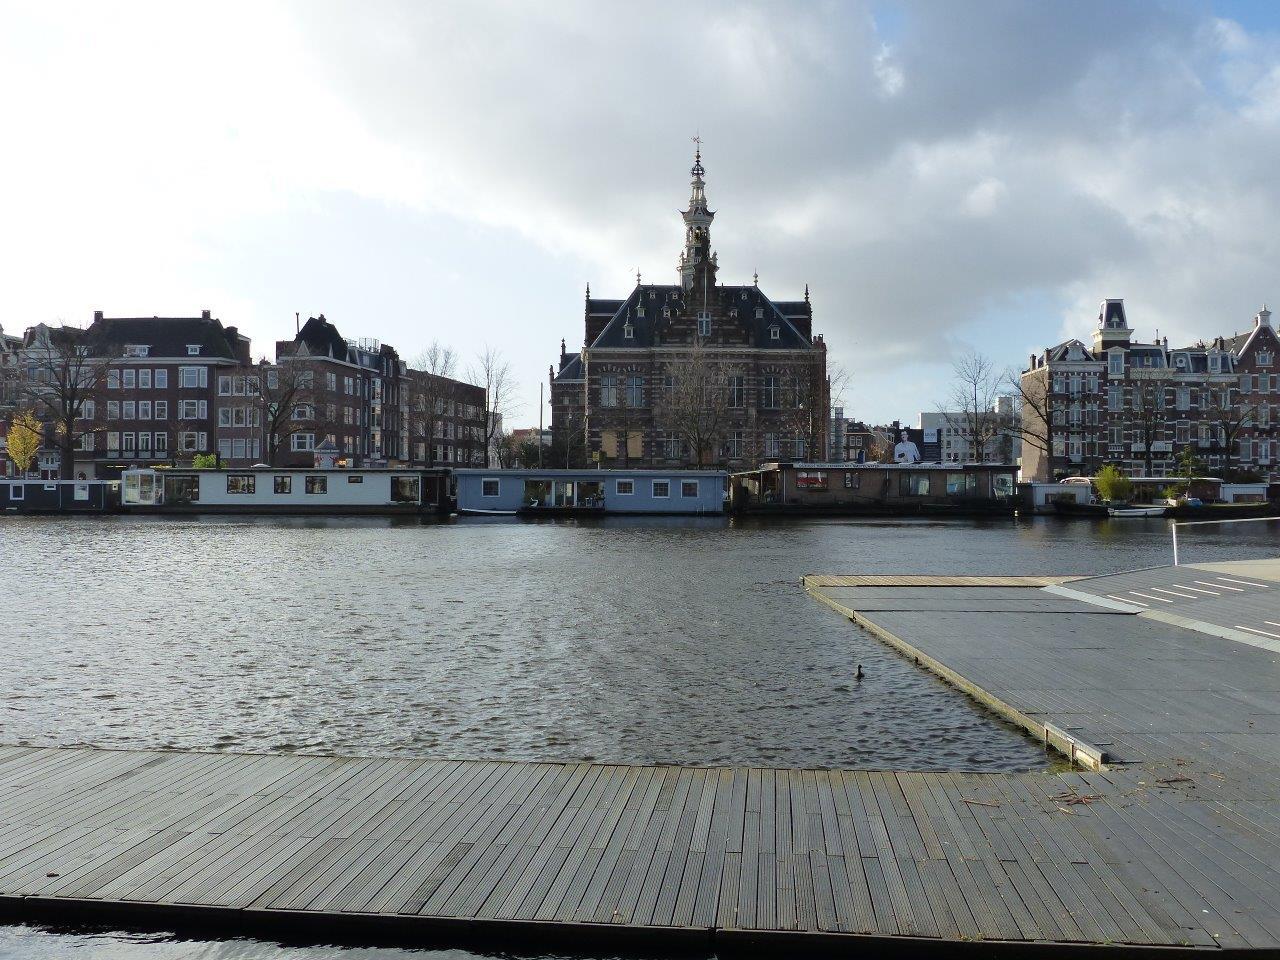 Burmanstraat, Amsterdam